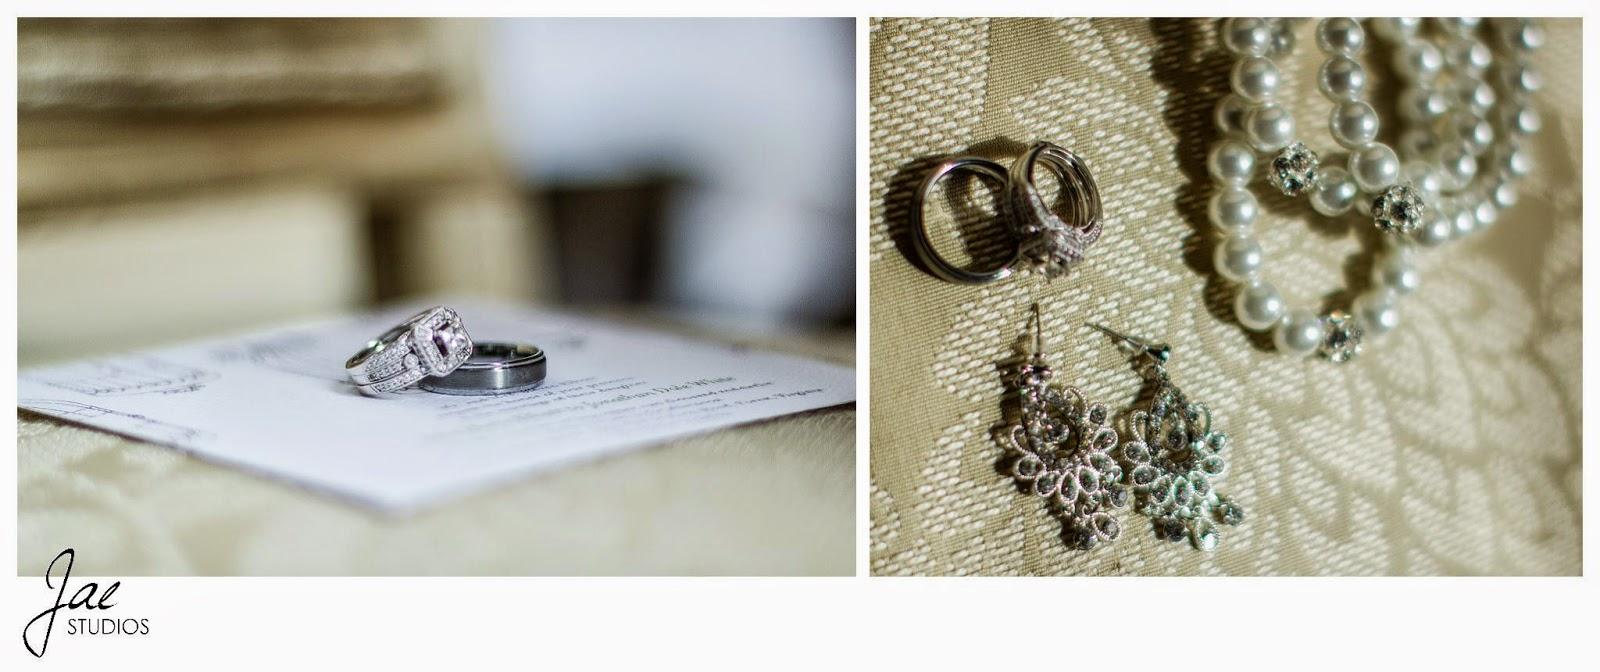 Jonathan and Julie, Bird cage, West Manor Estate, Wedding, Lynchburg, Virginia, Jae Studios, rings, pearls, earrings, necklace, jewelry